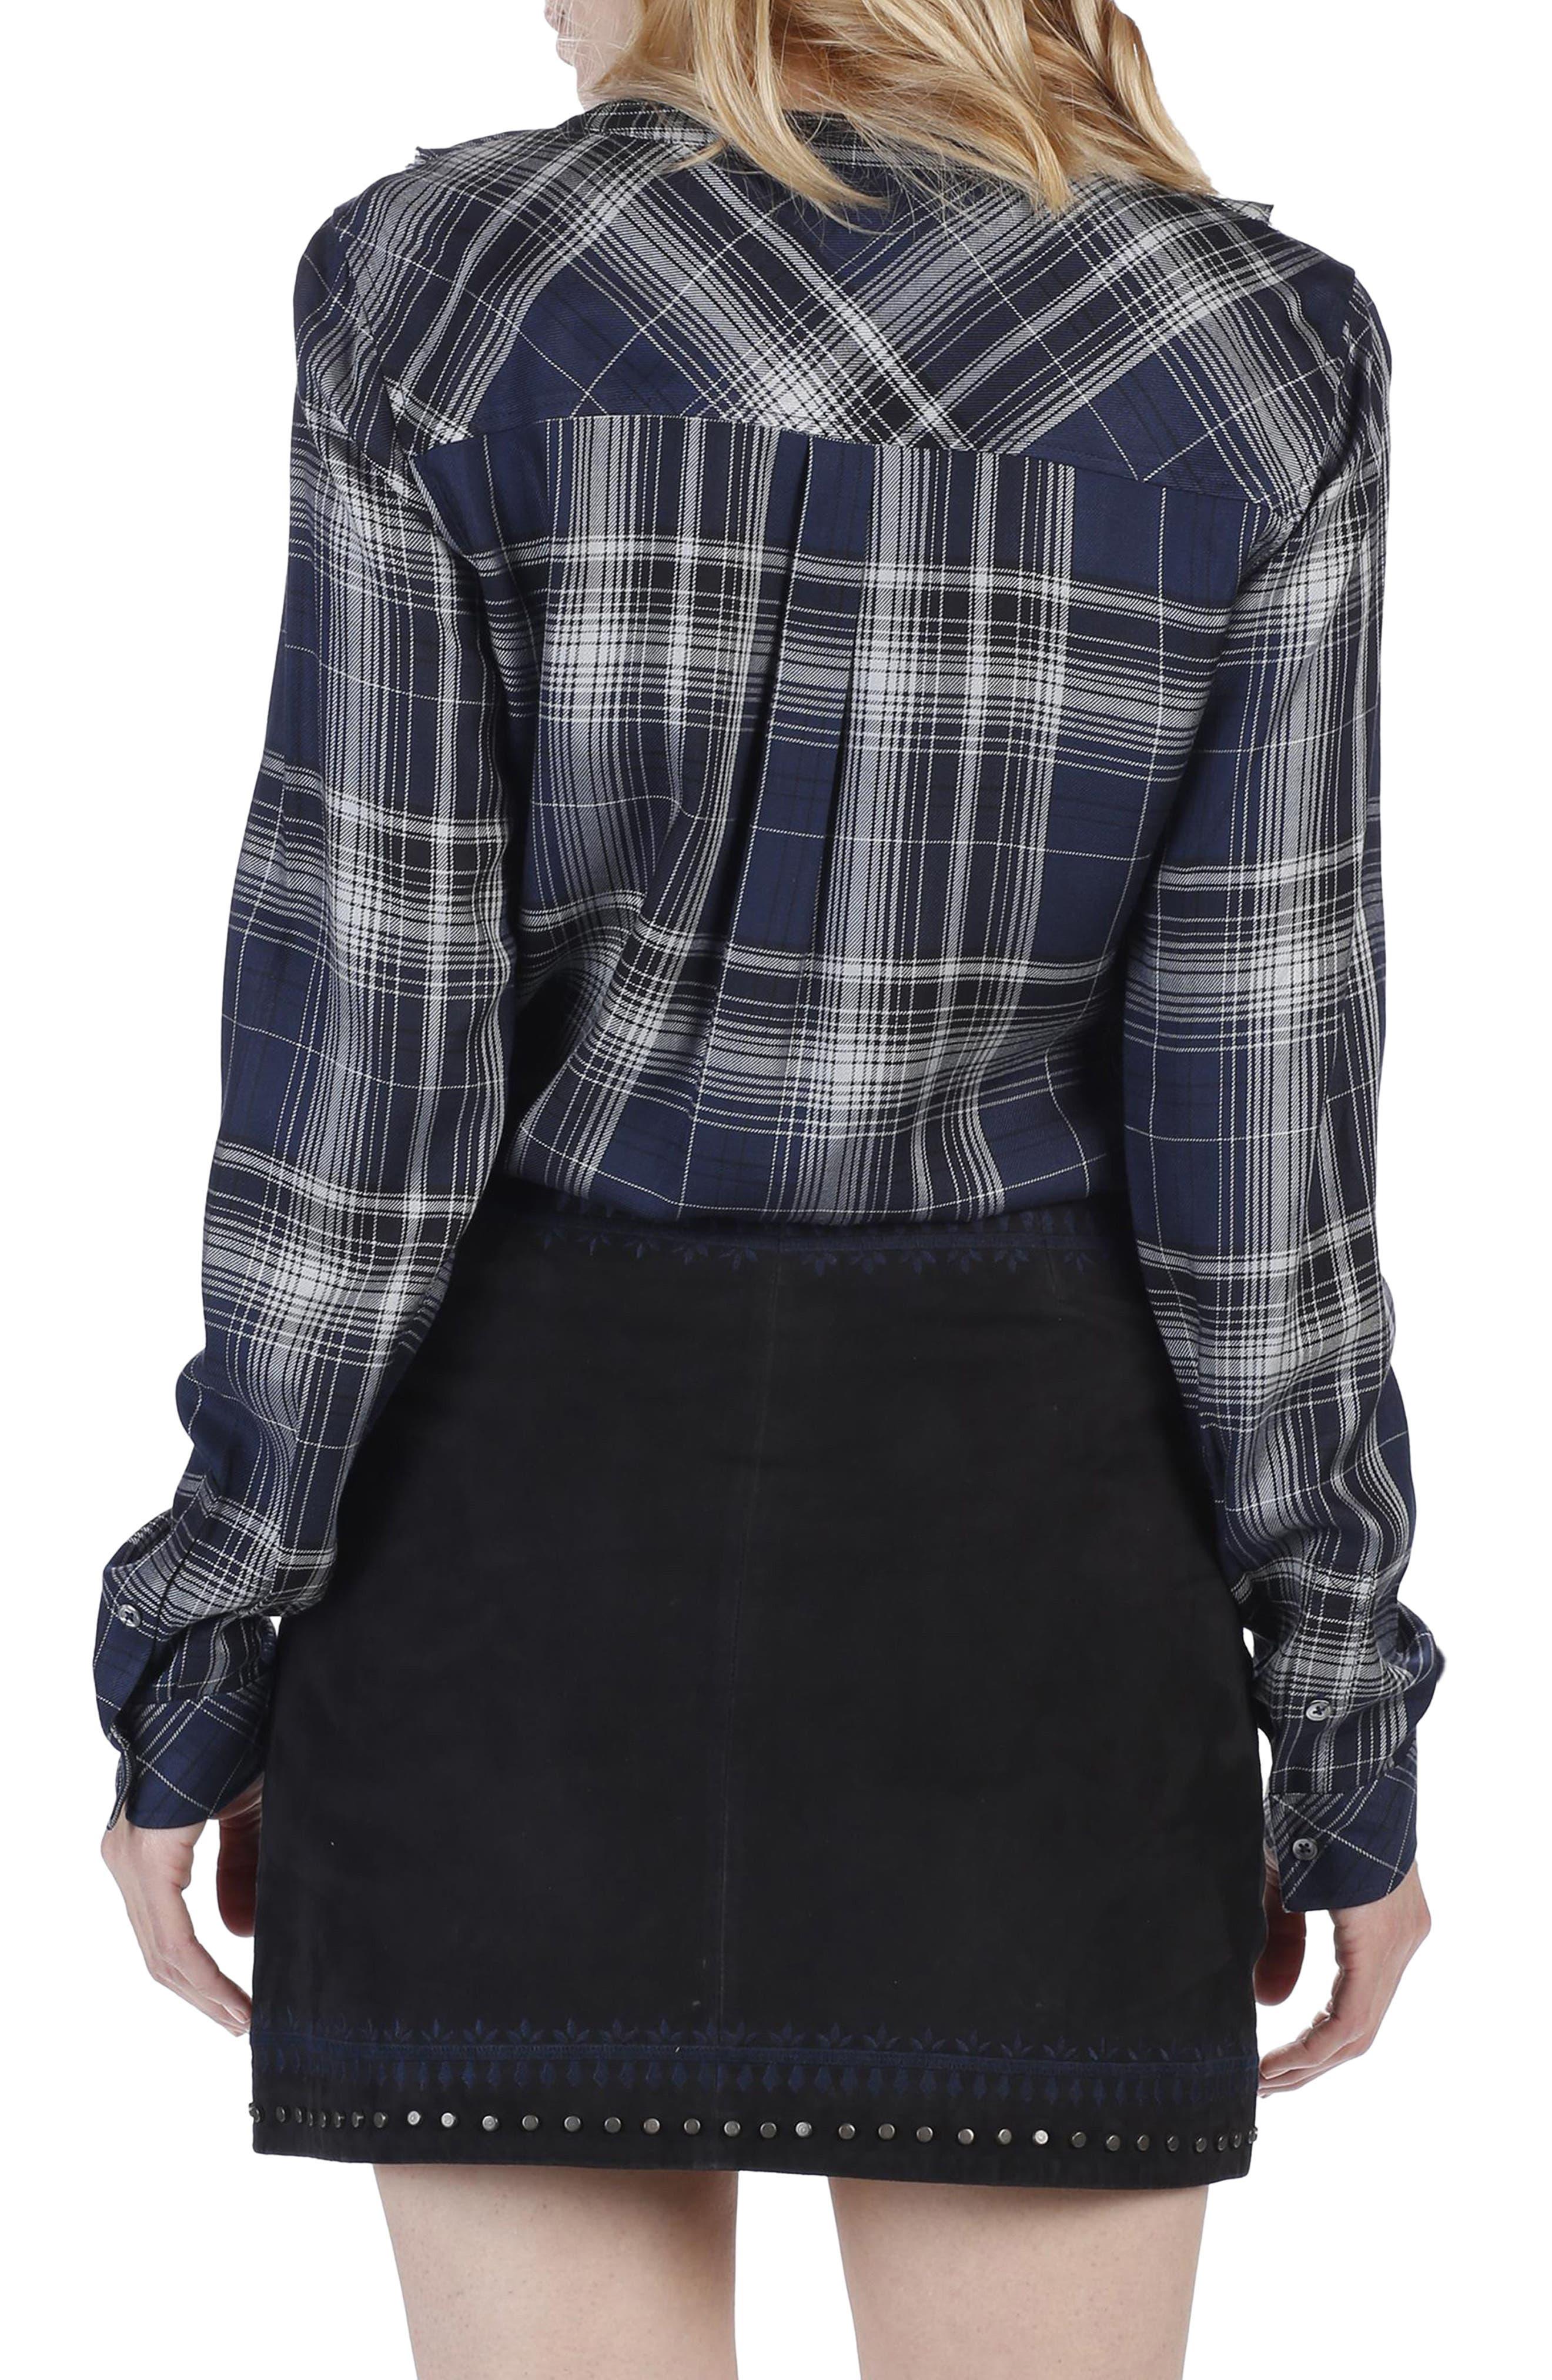 Bernette Ruffle Plaid Shirt,                             Alternate thumbnail 3, color,                             400